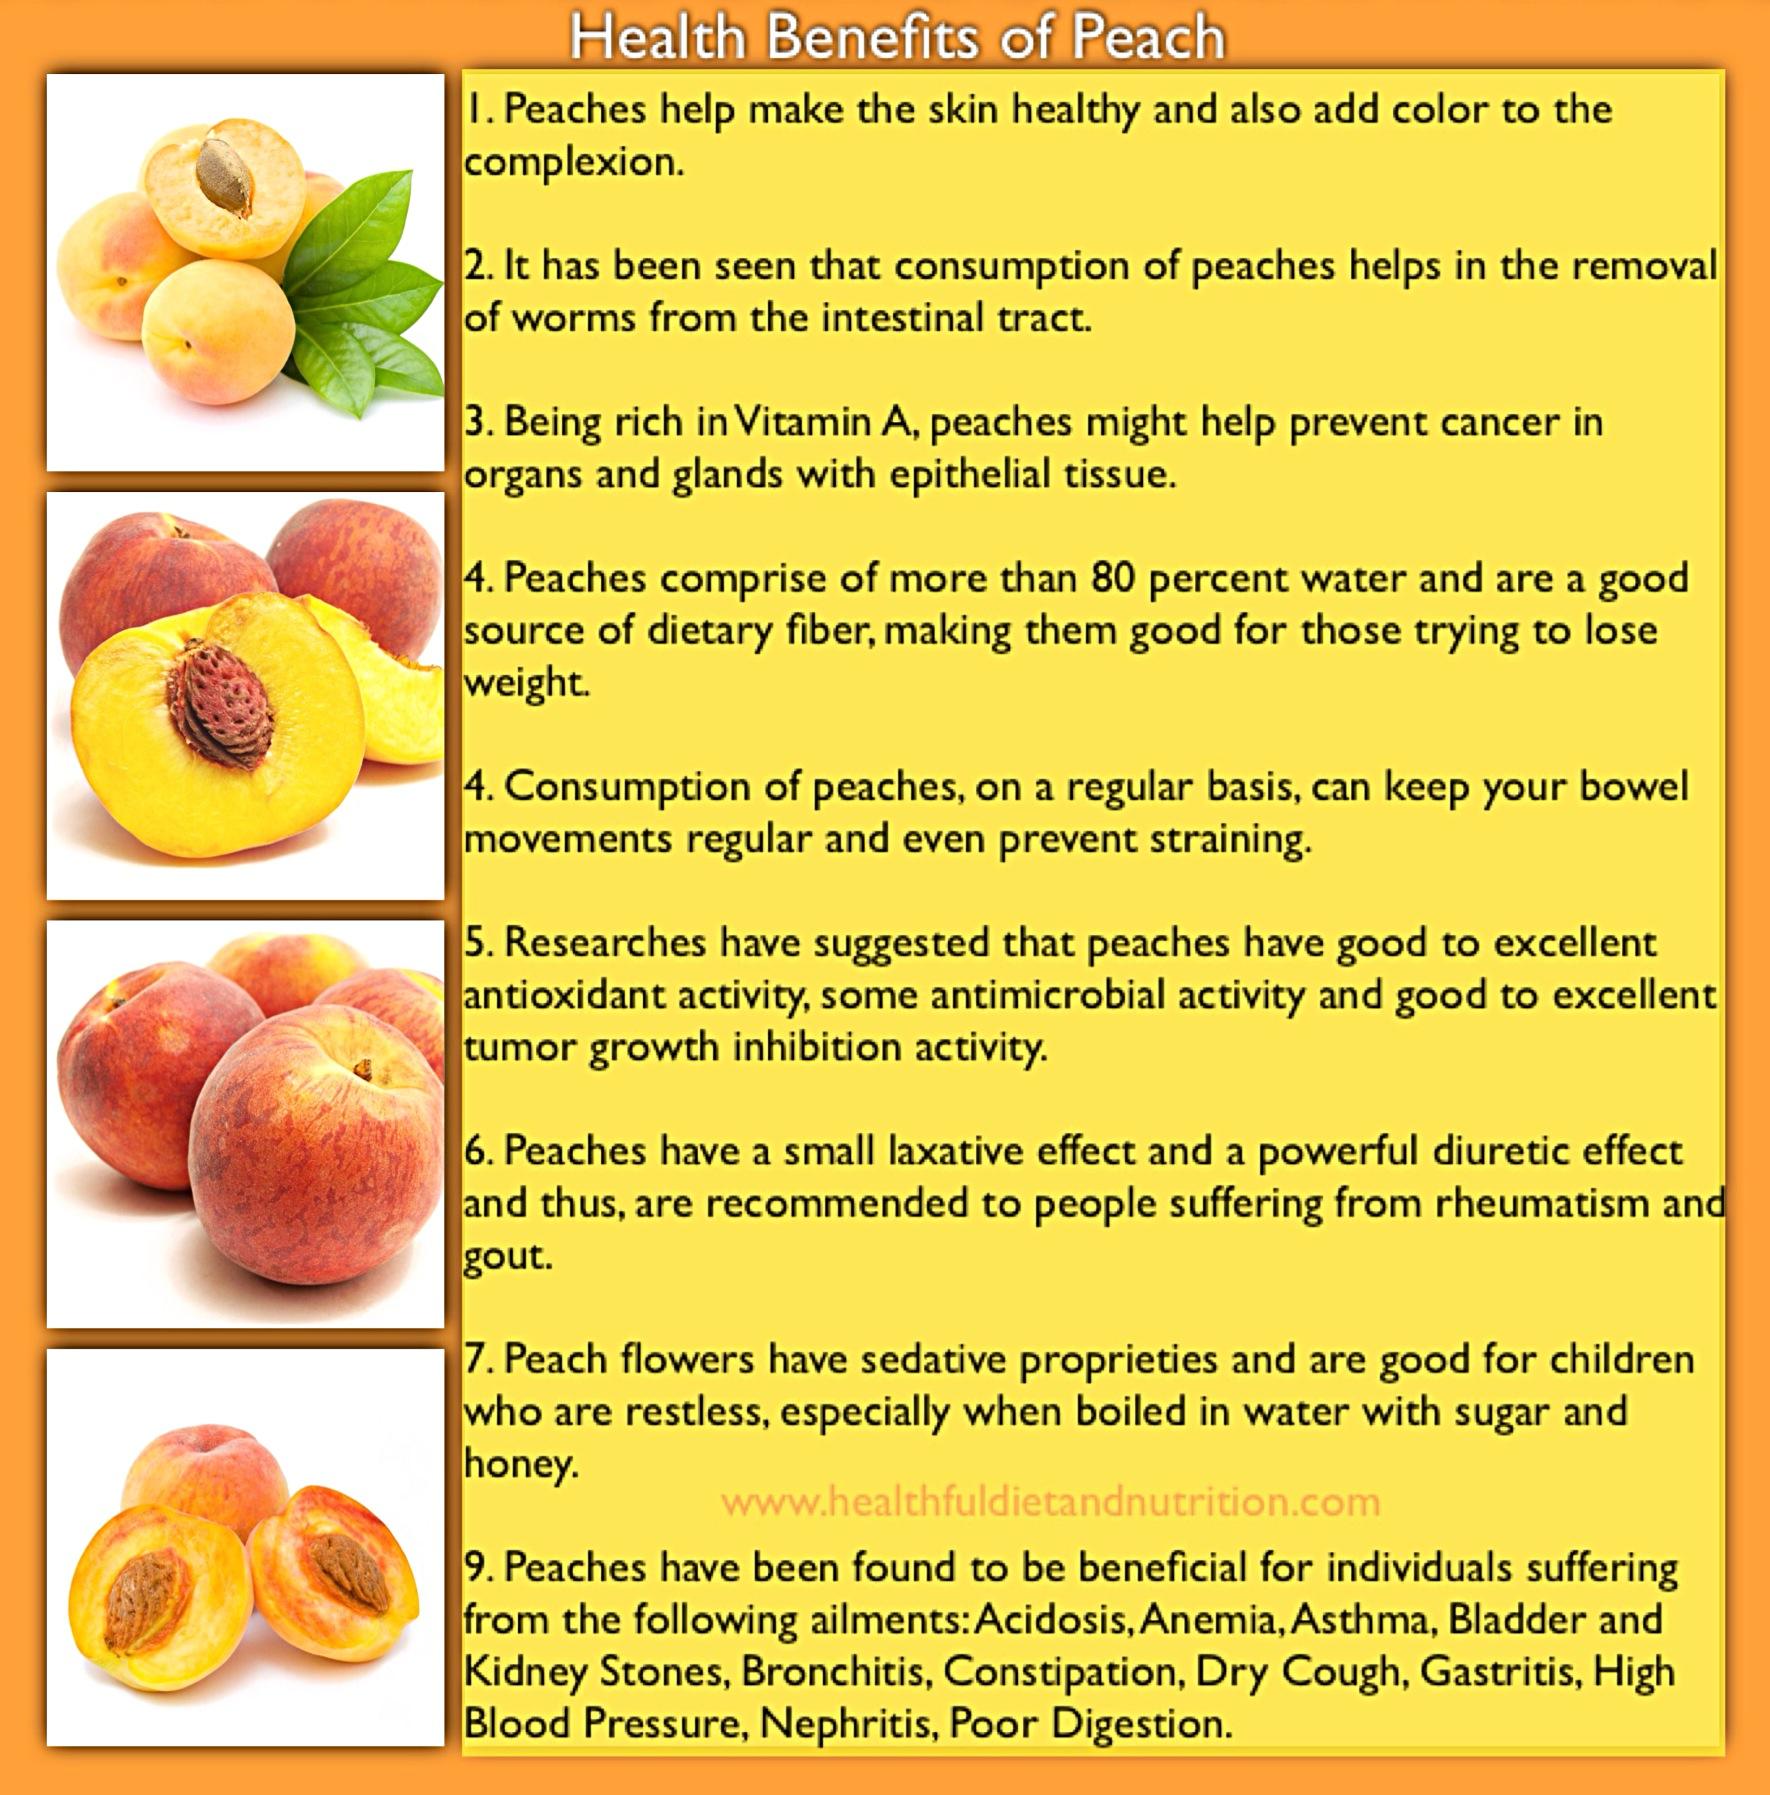 Health Benefits of Peach Fruit